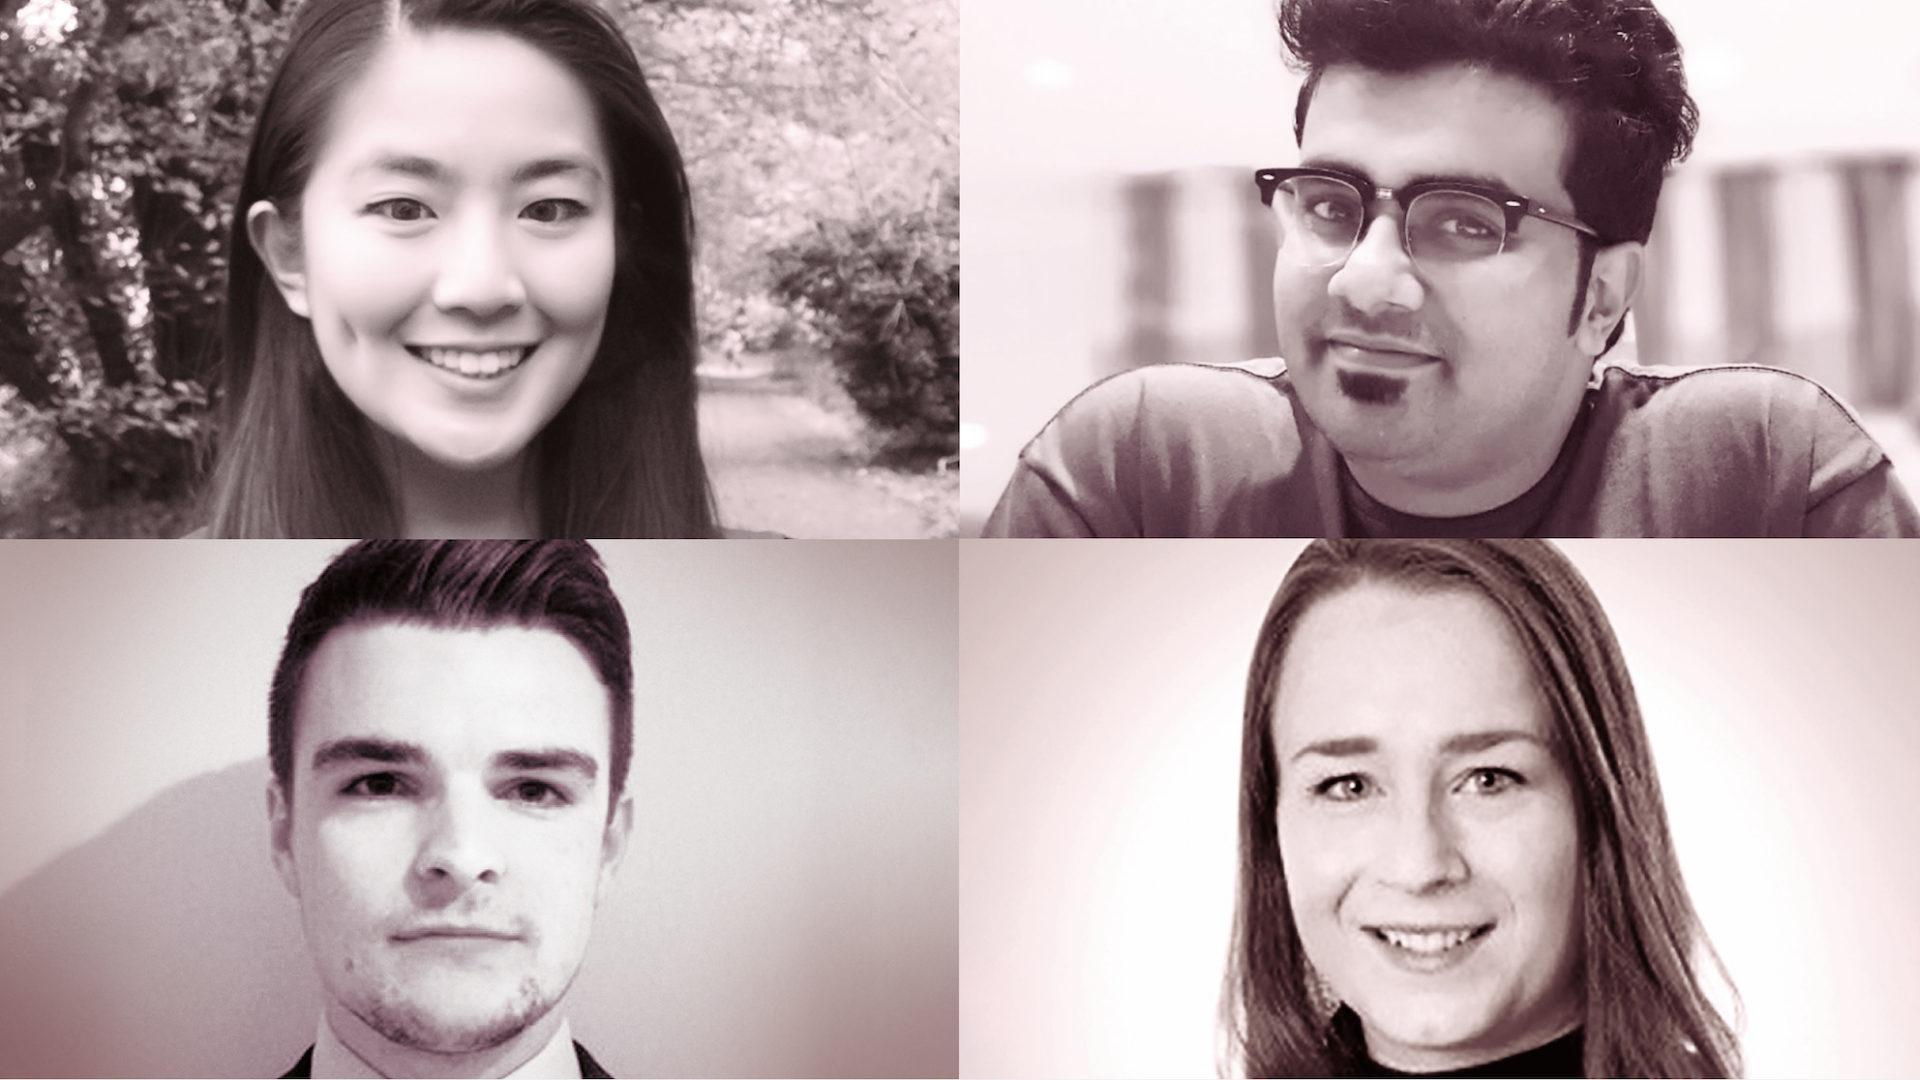 Clockwise from top left: Lin Qi; Don Sibe; Rachael Keeble; Joshua Waterman